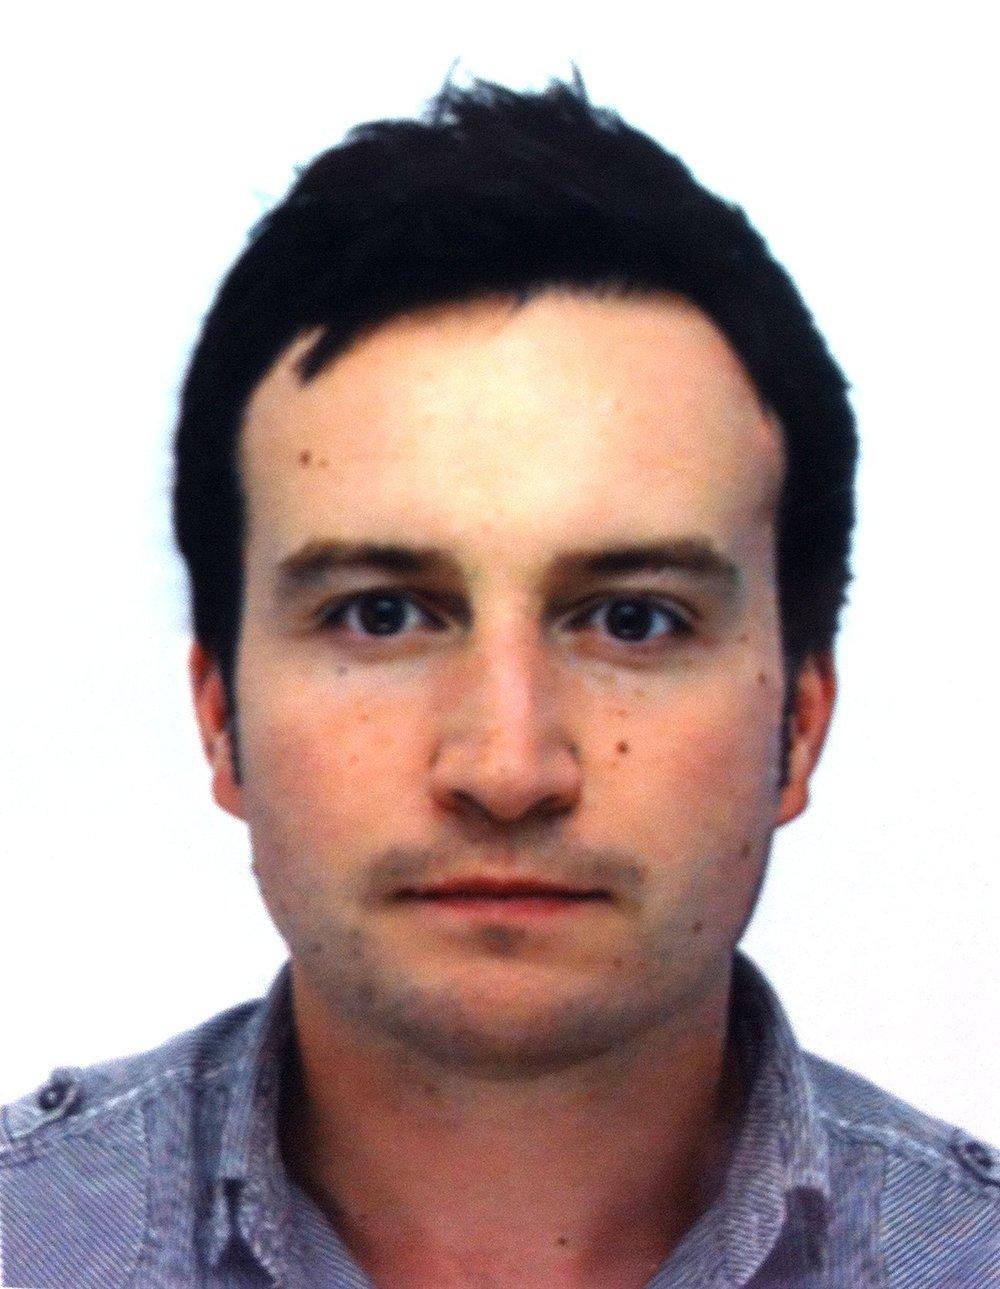 profile_image1.jpg